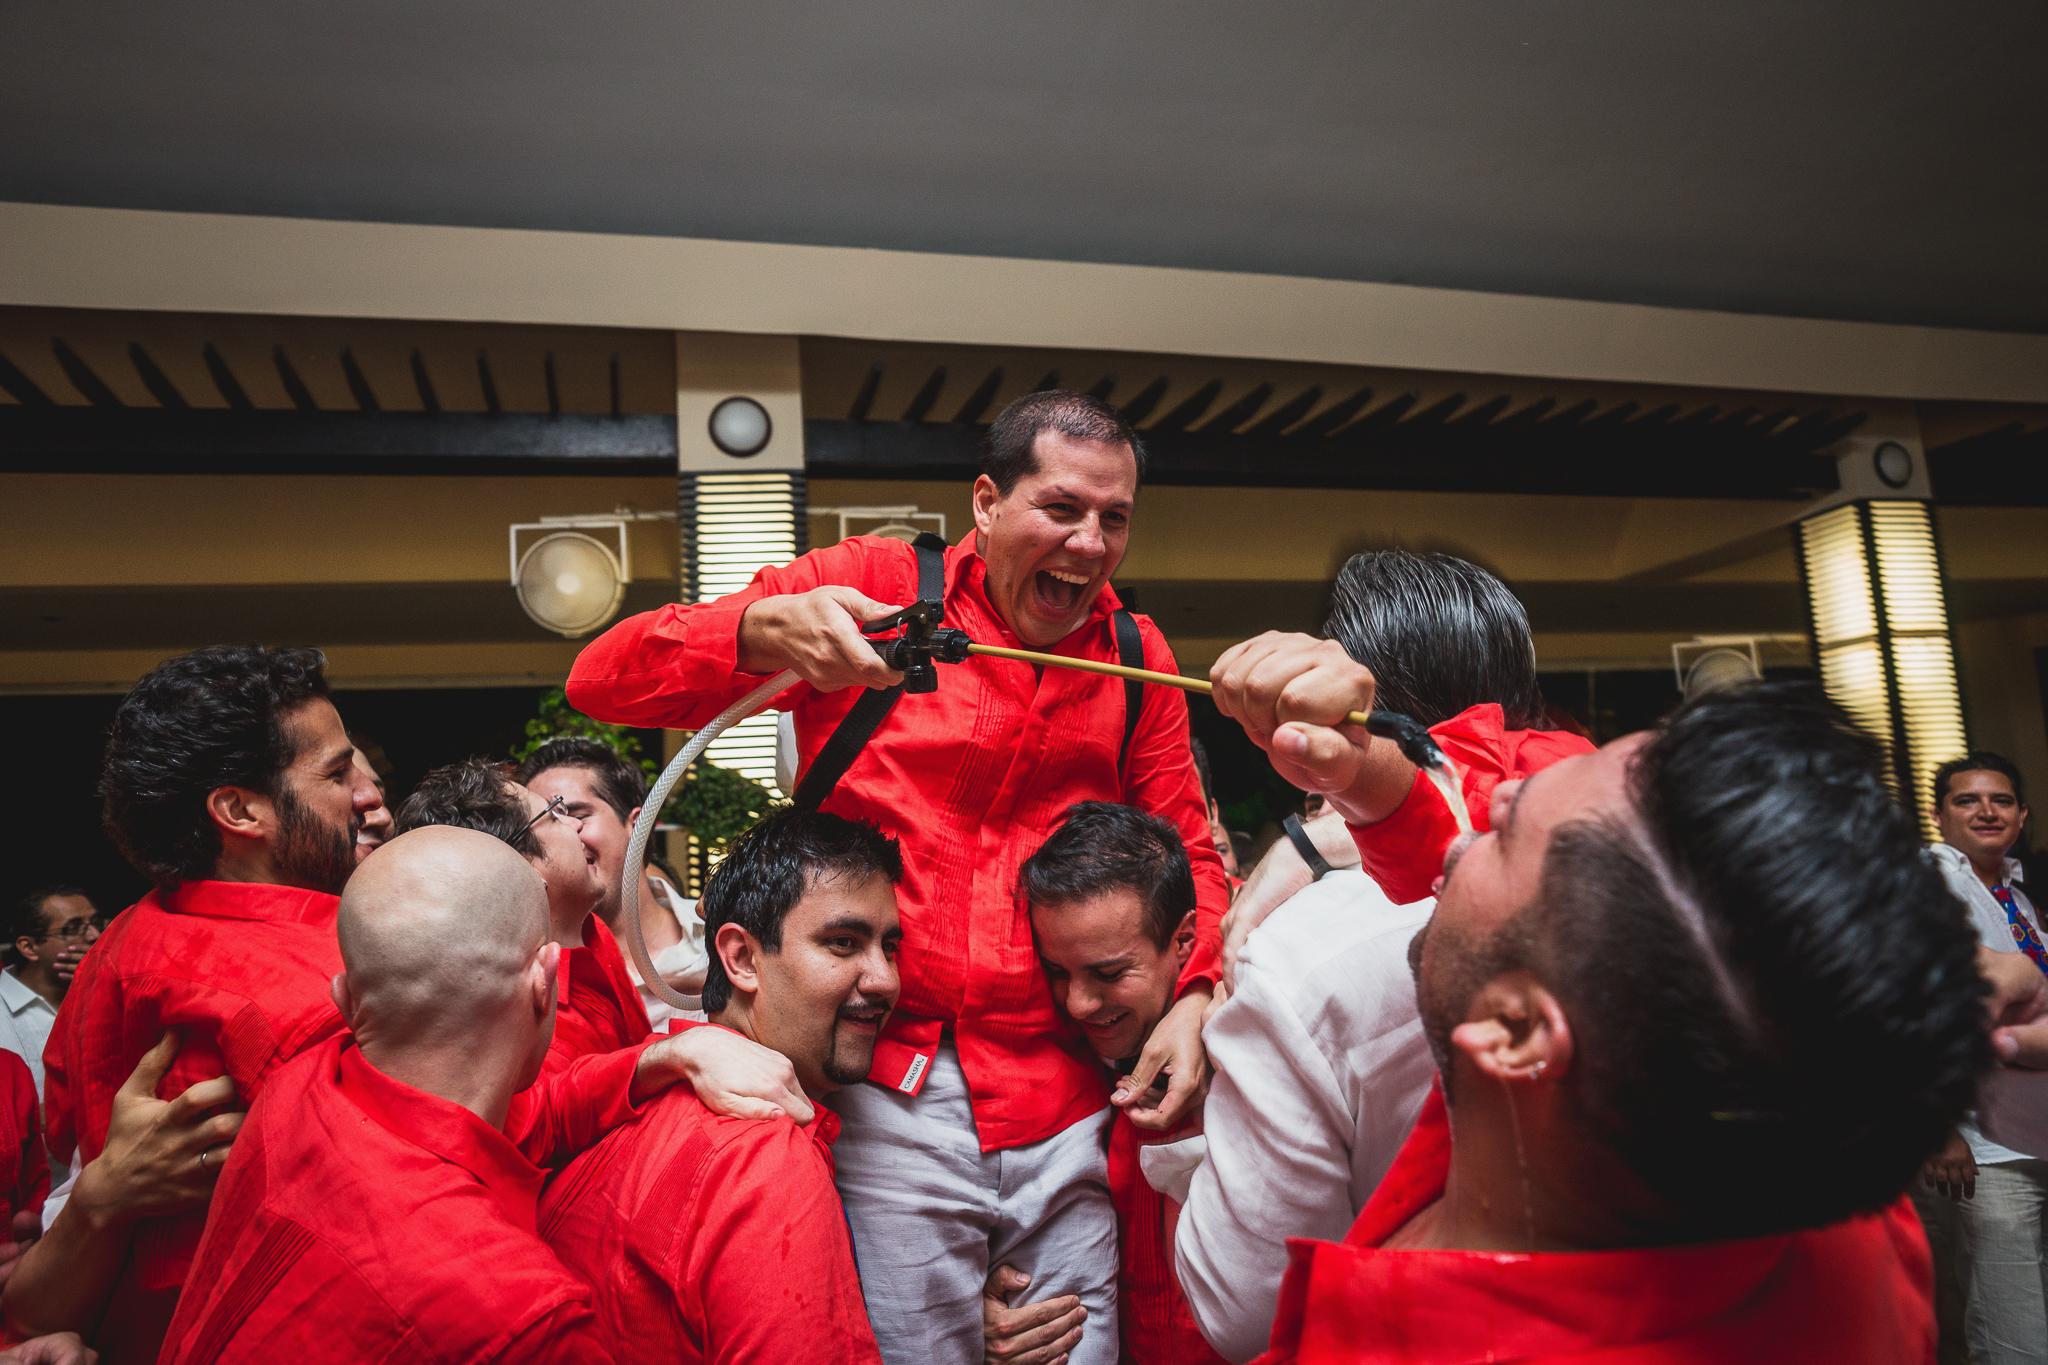 wedding-photography-mexico-quinta-rubelinas-6.jpg